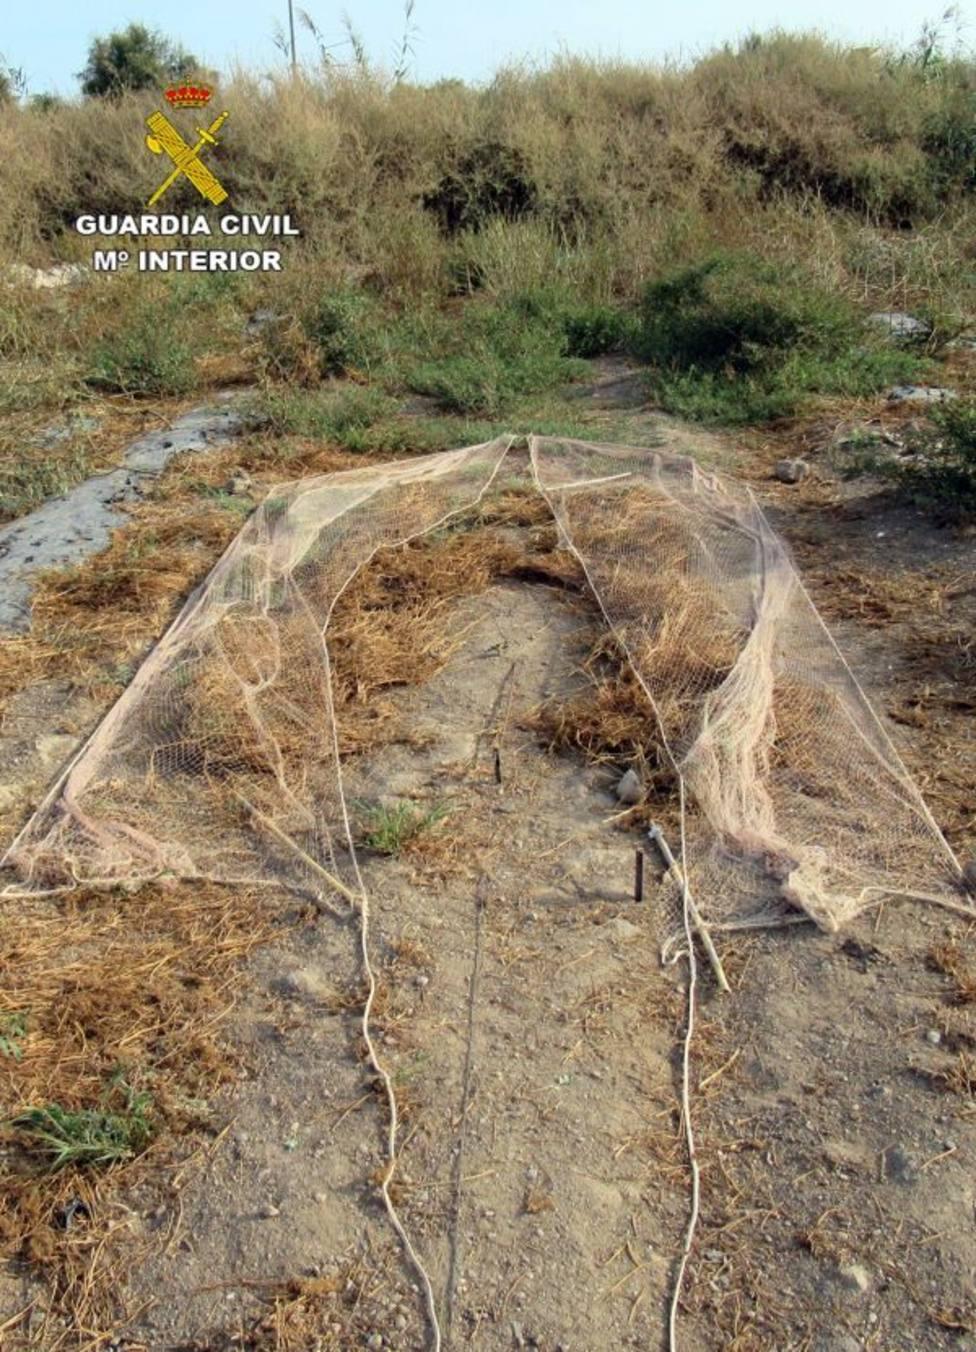 La Guardia Civil investiga a un vecino de Águilas por la captura ilegal de aves fringílidas